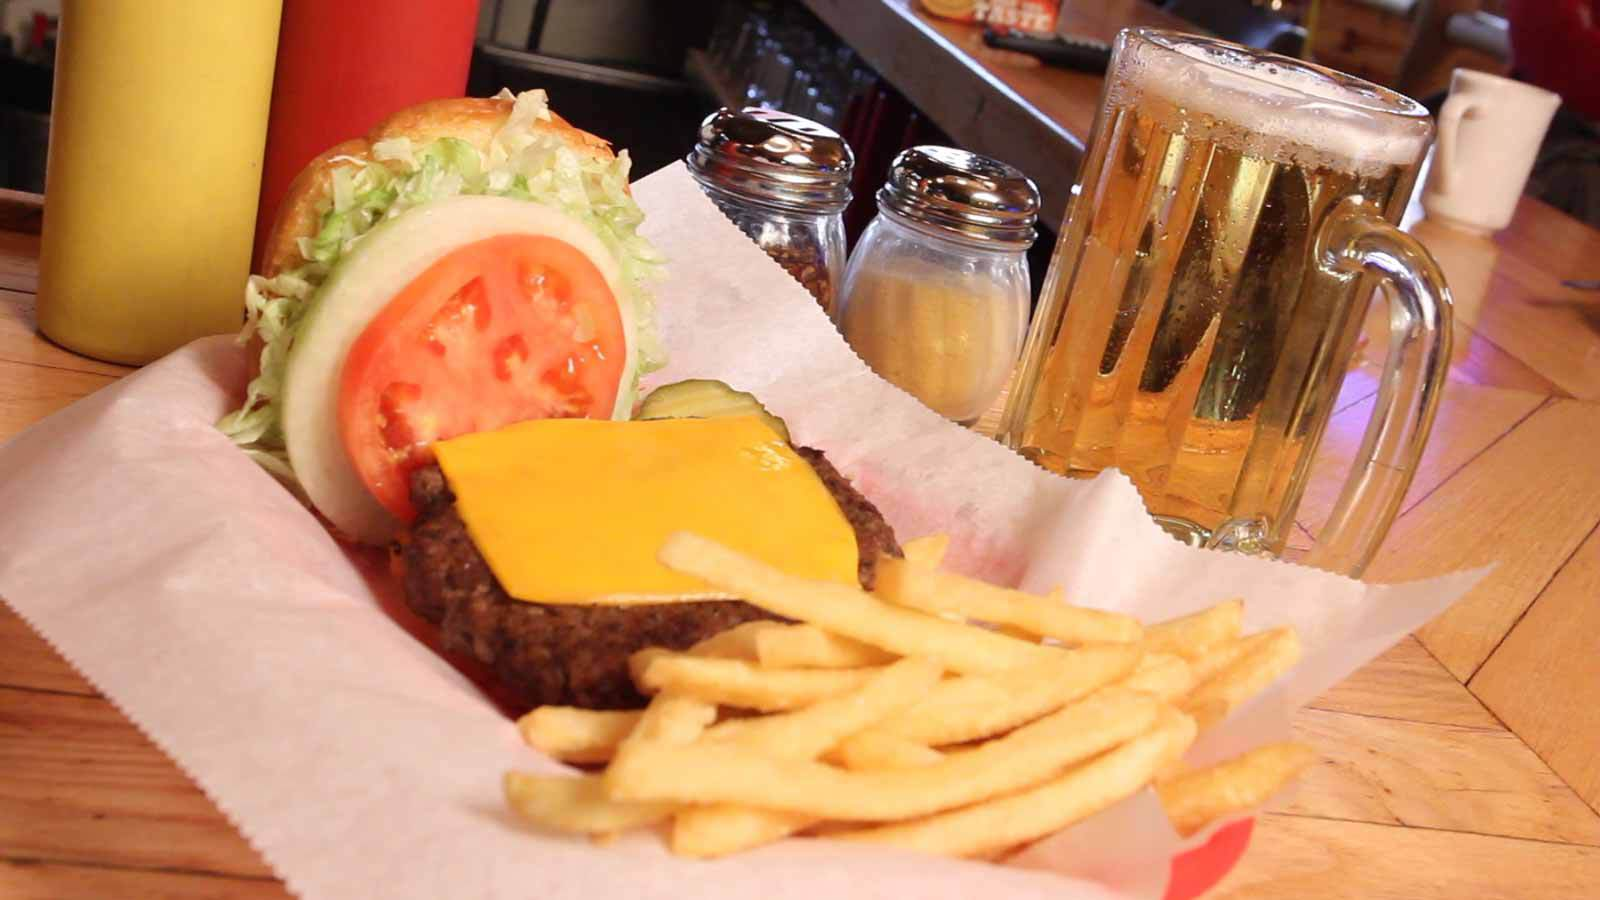 Krazy K's Cheeseburger